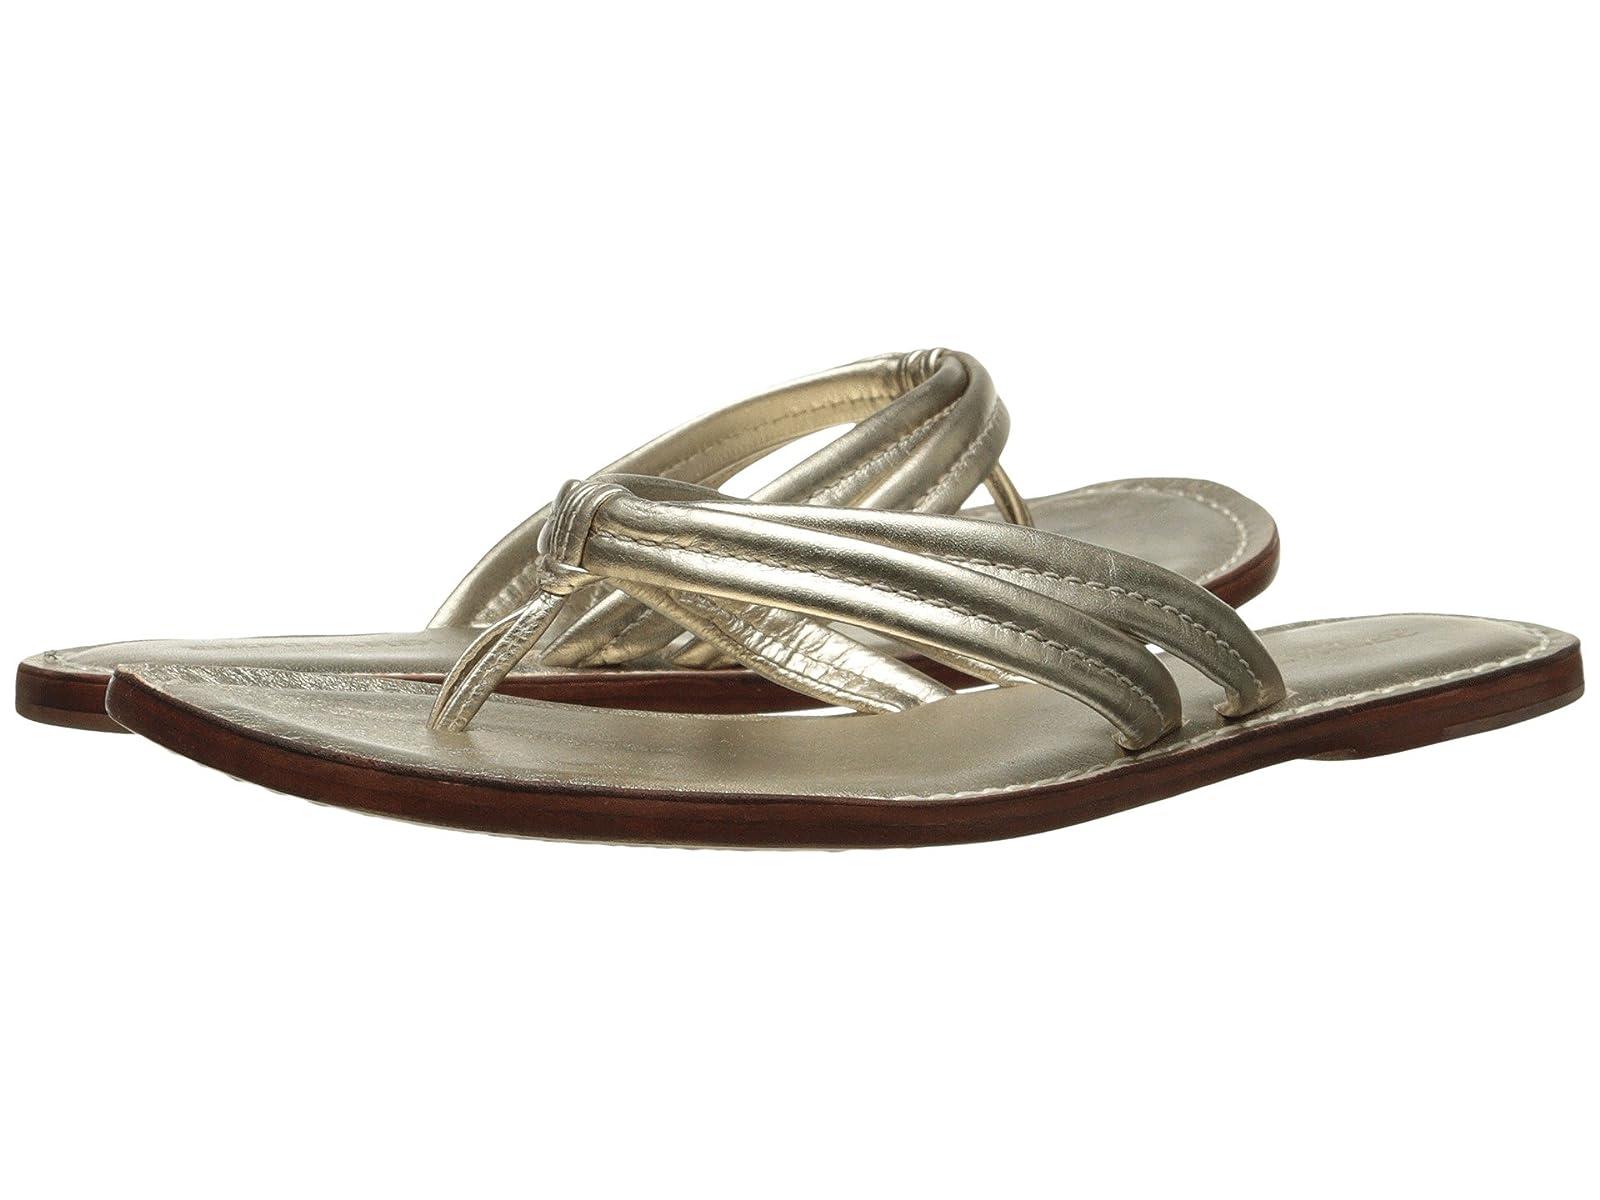 Bernardo Miami SandalComfortable and distinctive shoes